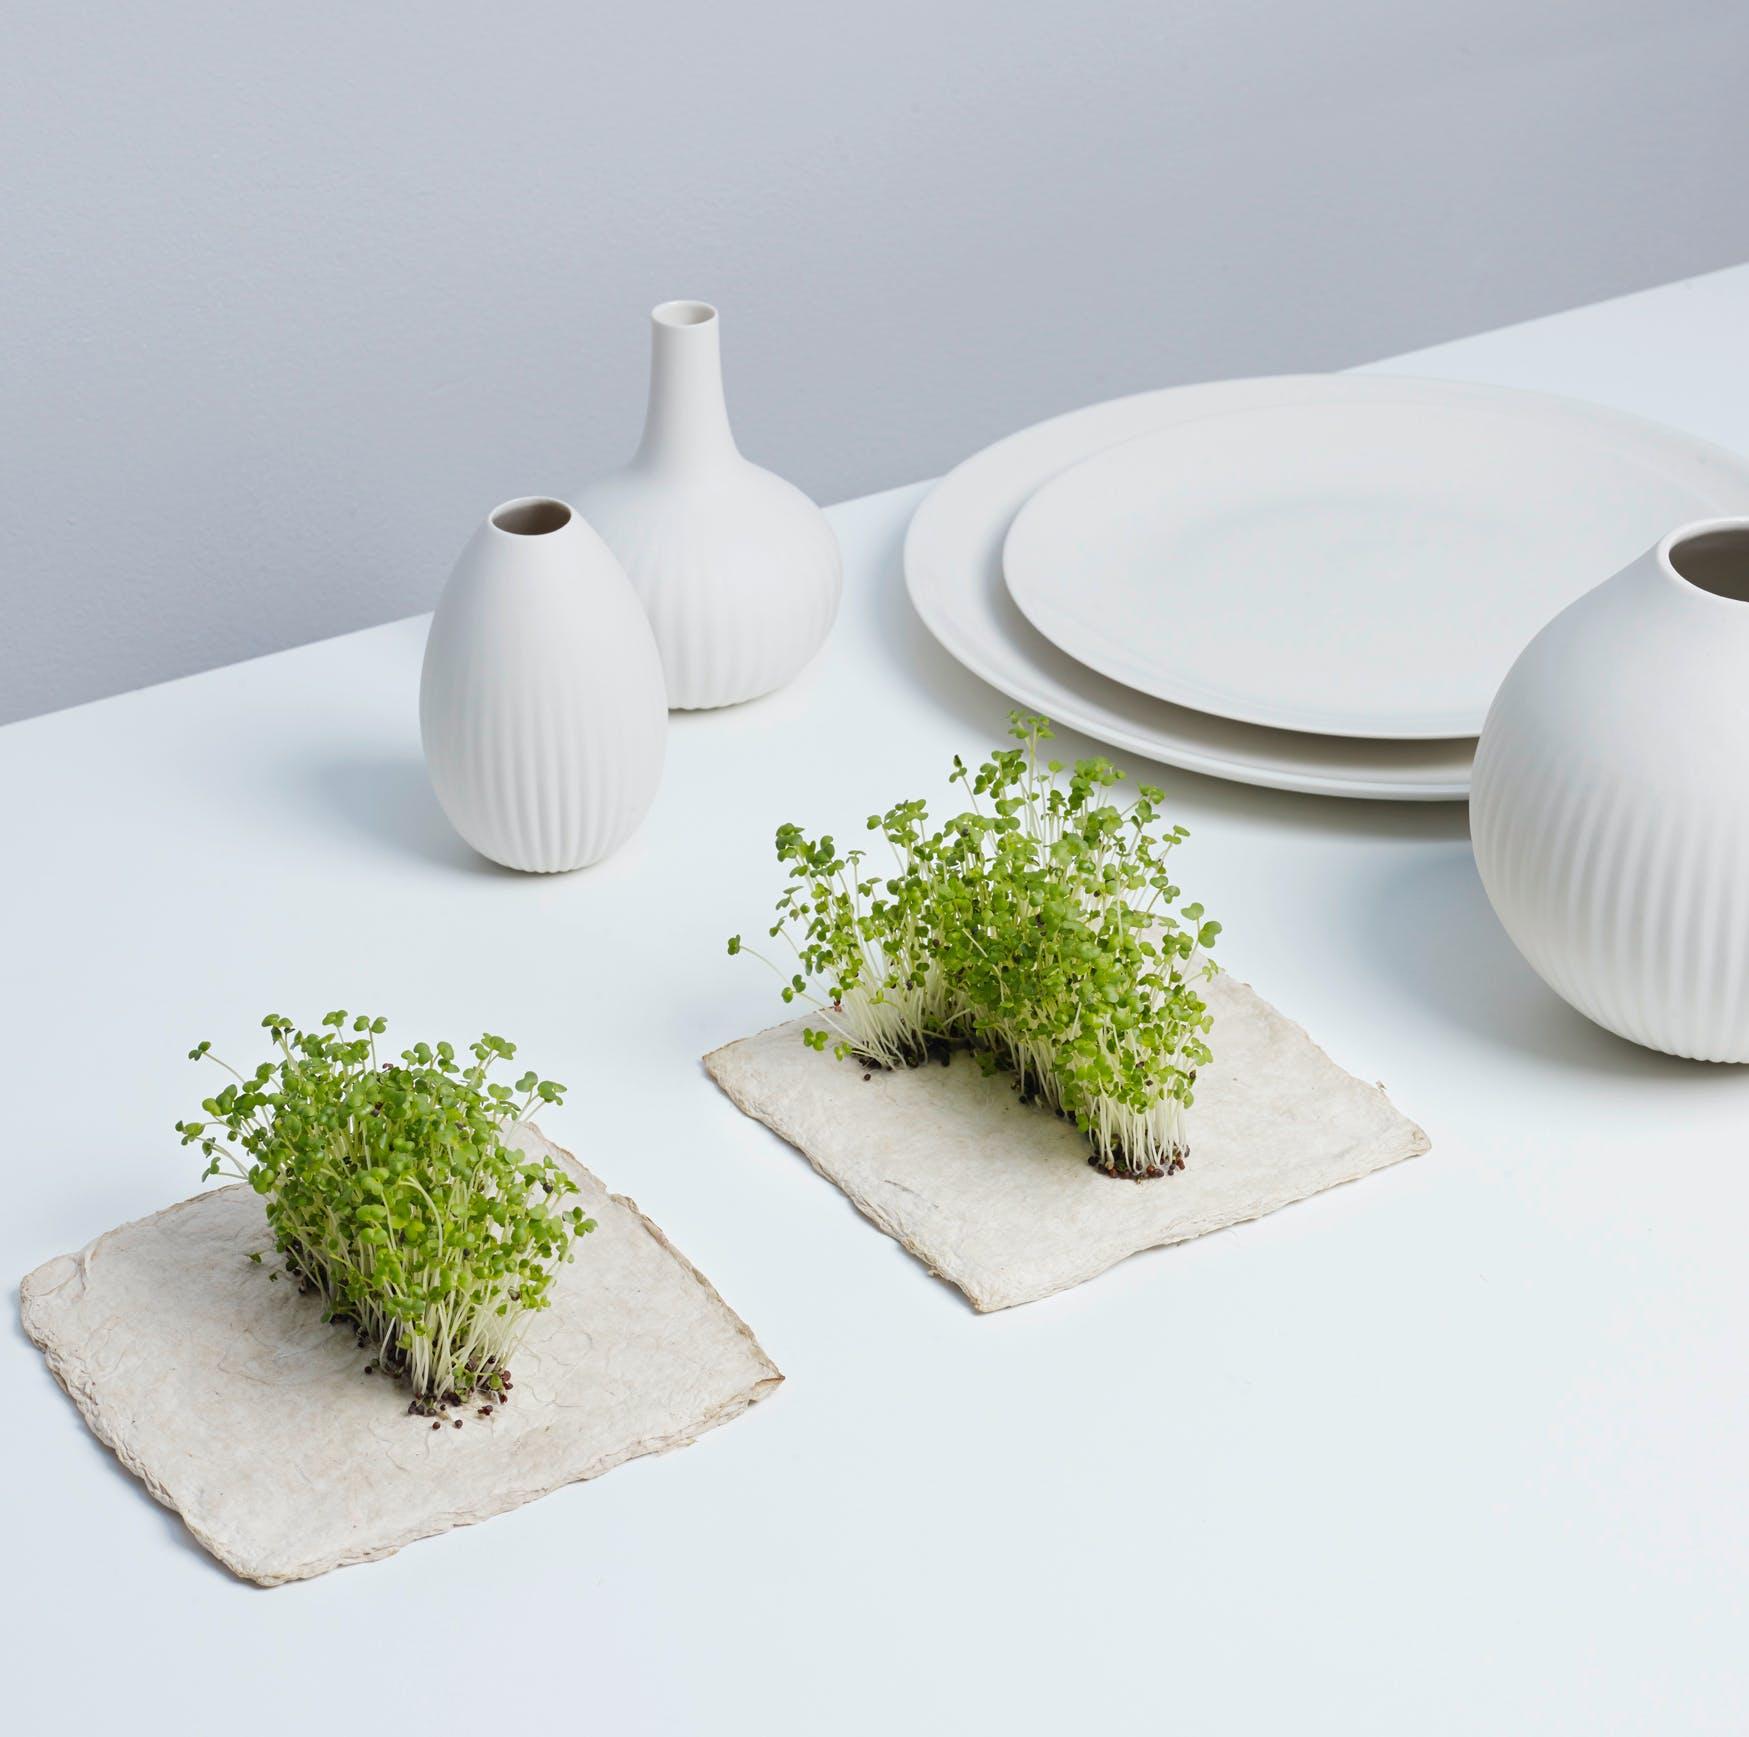 Plant Growing Paper (LIVE)